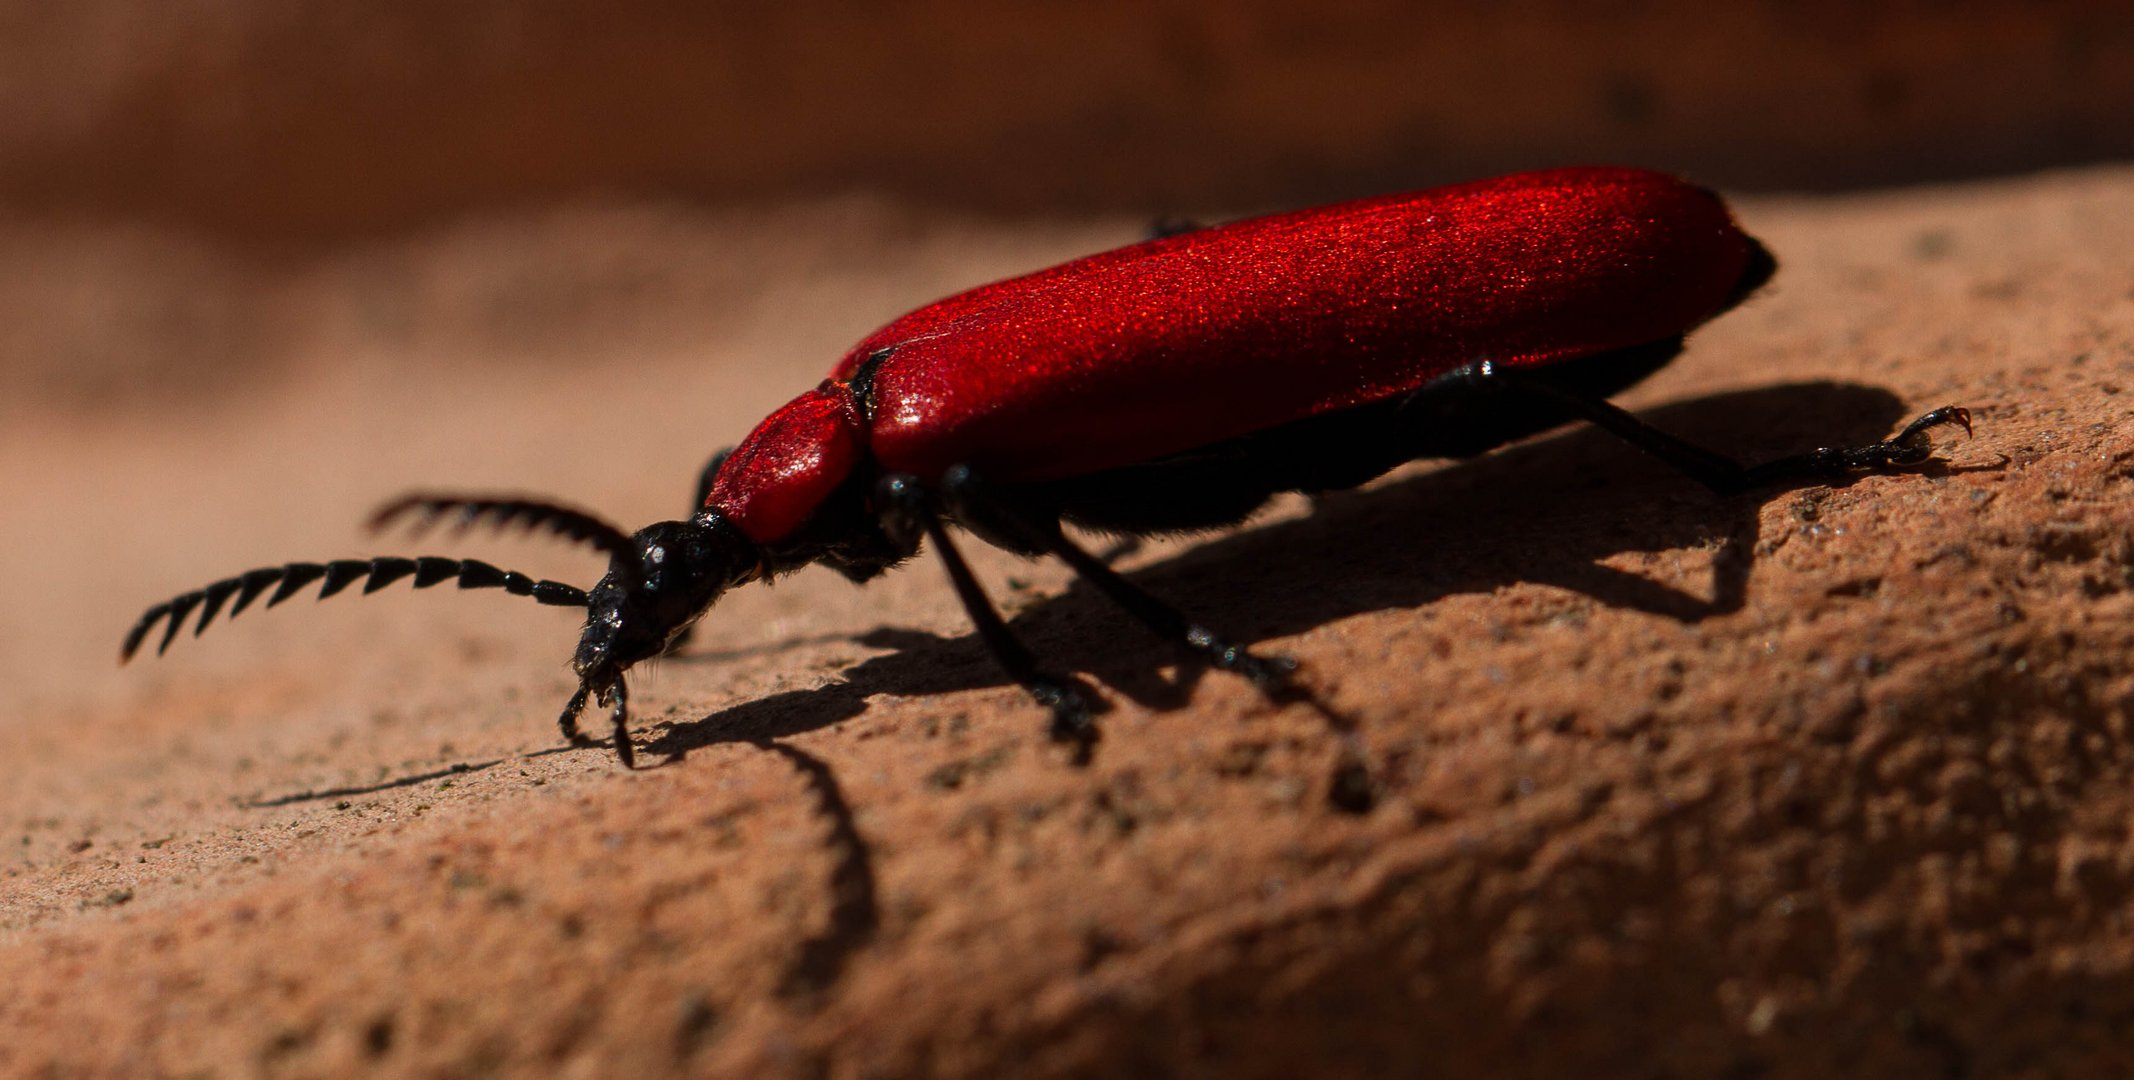 Ein Flotter Käfer